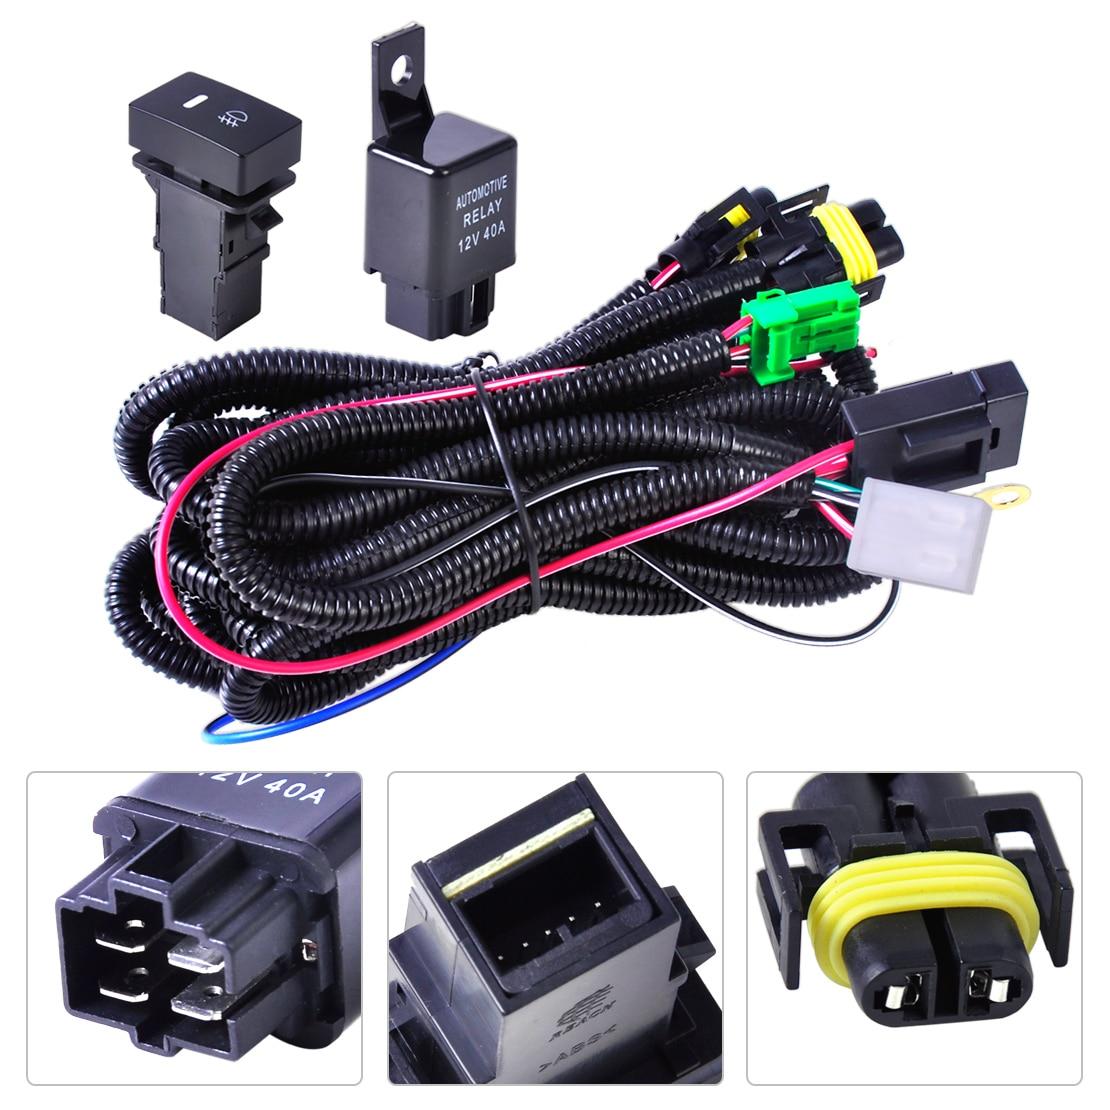 medium resolution of dwcx wiring harness sockets wire switch for h11 fog light 2005 silverado radio wiring harness wiring